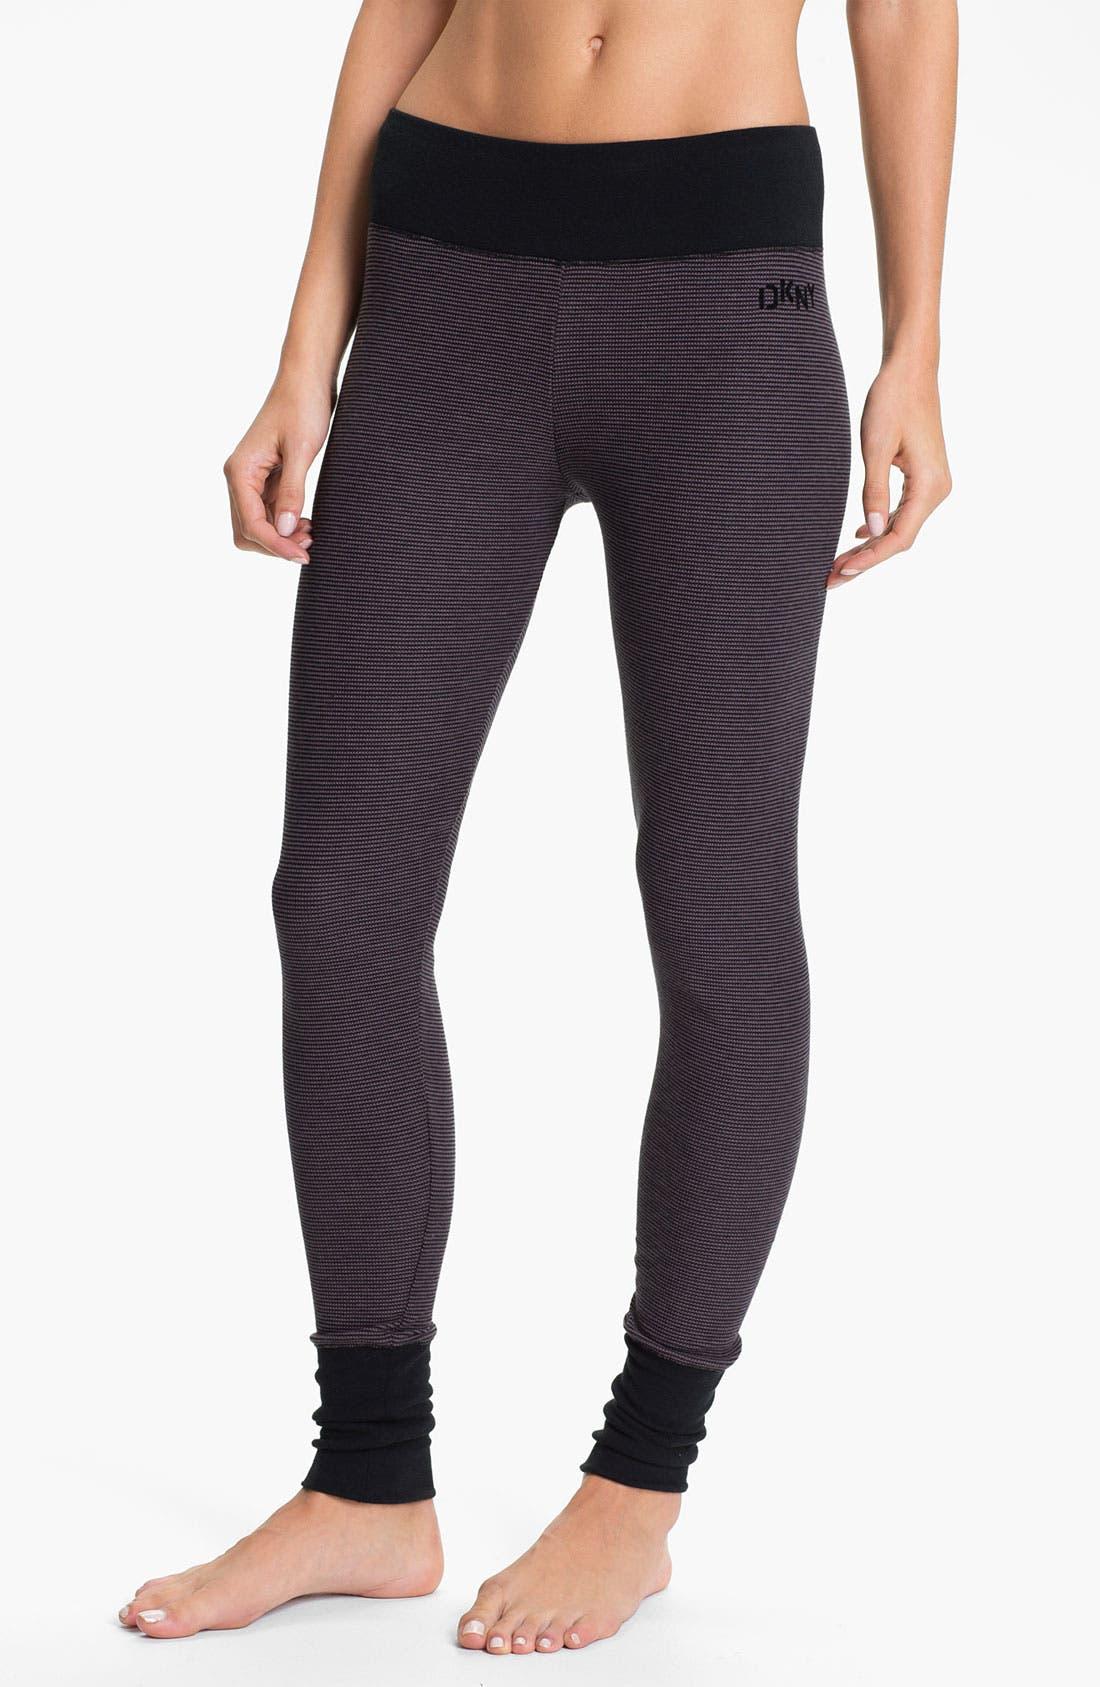 Main Image - DKNY Base Layer Cuff Leggings